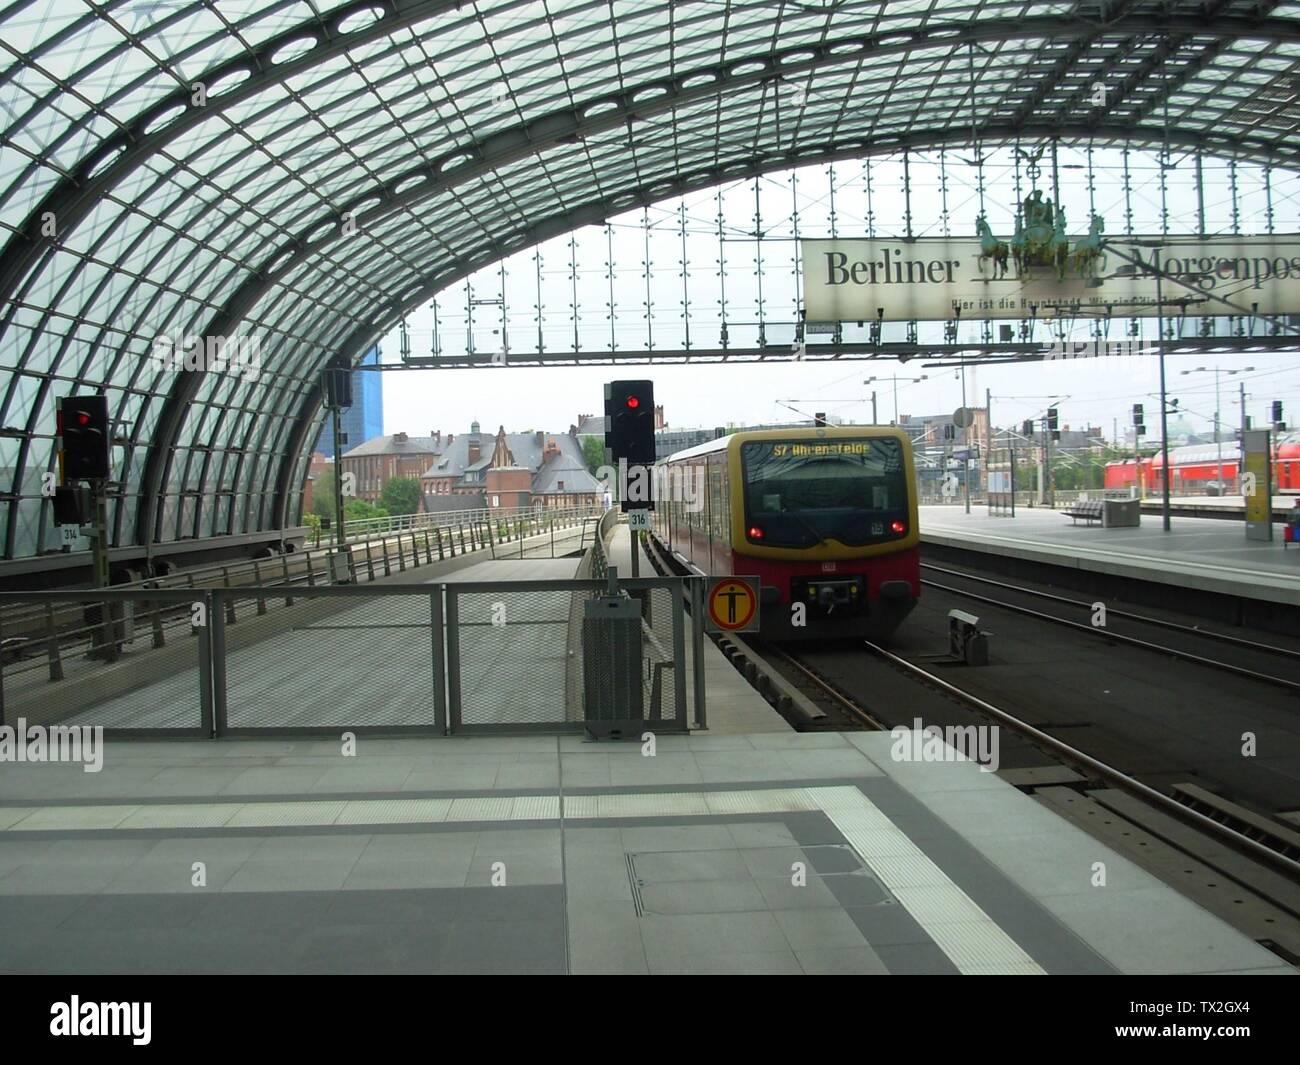 """English: Eastbound S7 train leaving the Berlin Hauptbahnhof en route for Ahrensfelde.; 14 August 2008; Own work (Jef Kazak); Il Dottore Magnifico a.k.a.Jef Kazak (talk); "" Stock Photo"